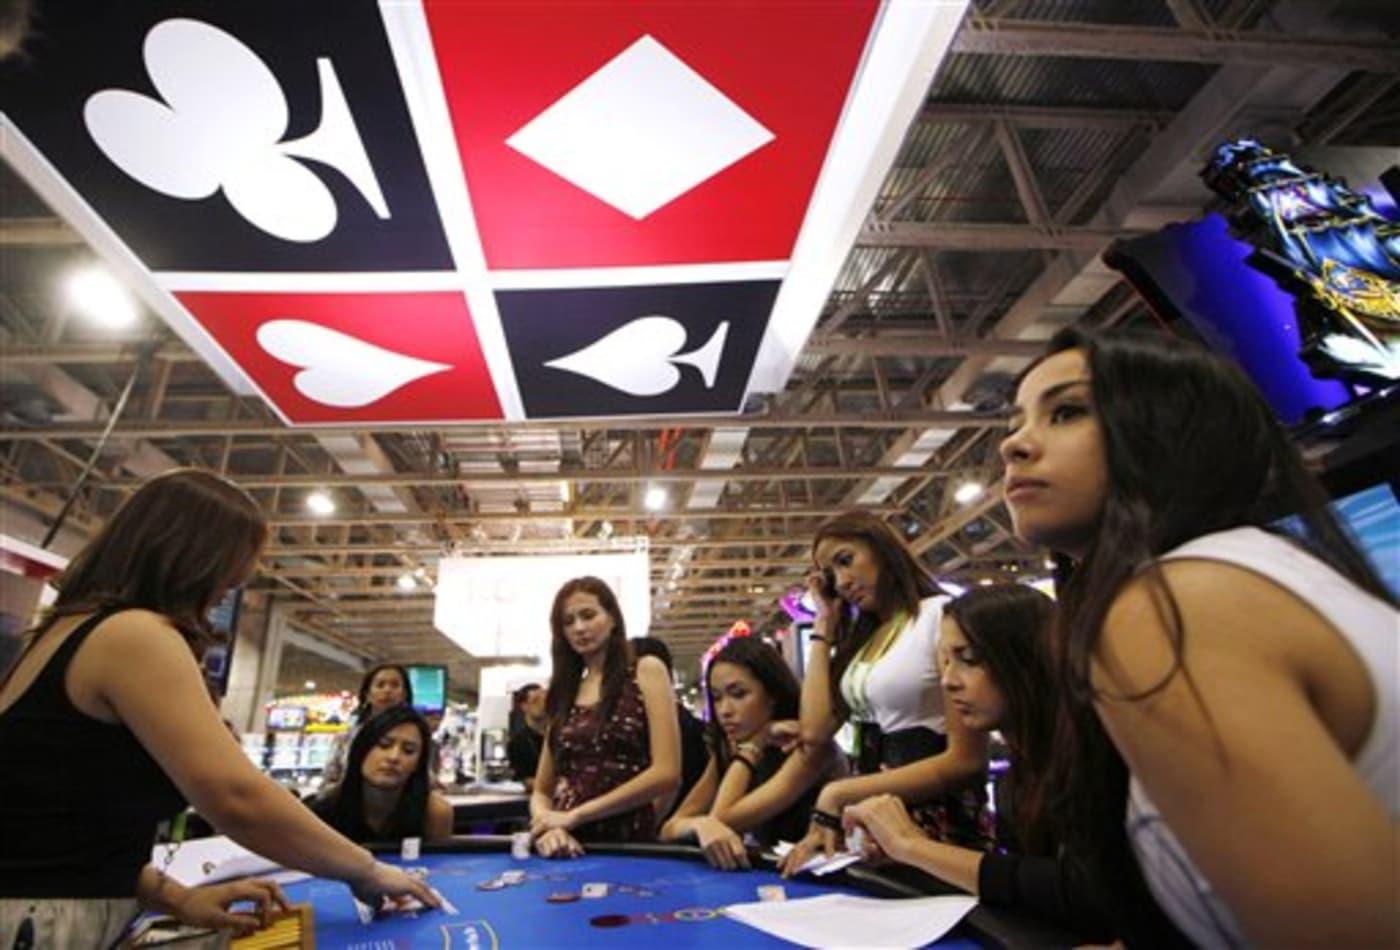 macau asia gambling on casinos -1331414903_v2.jpg